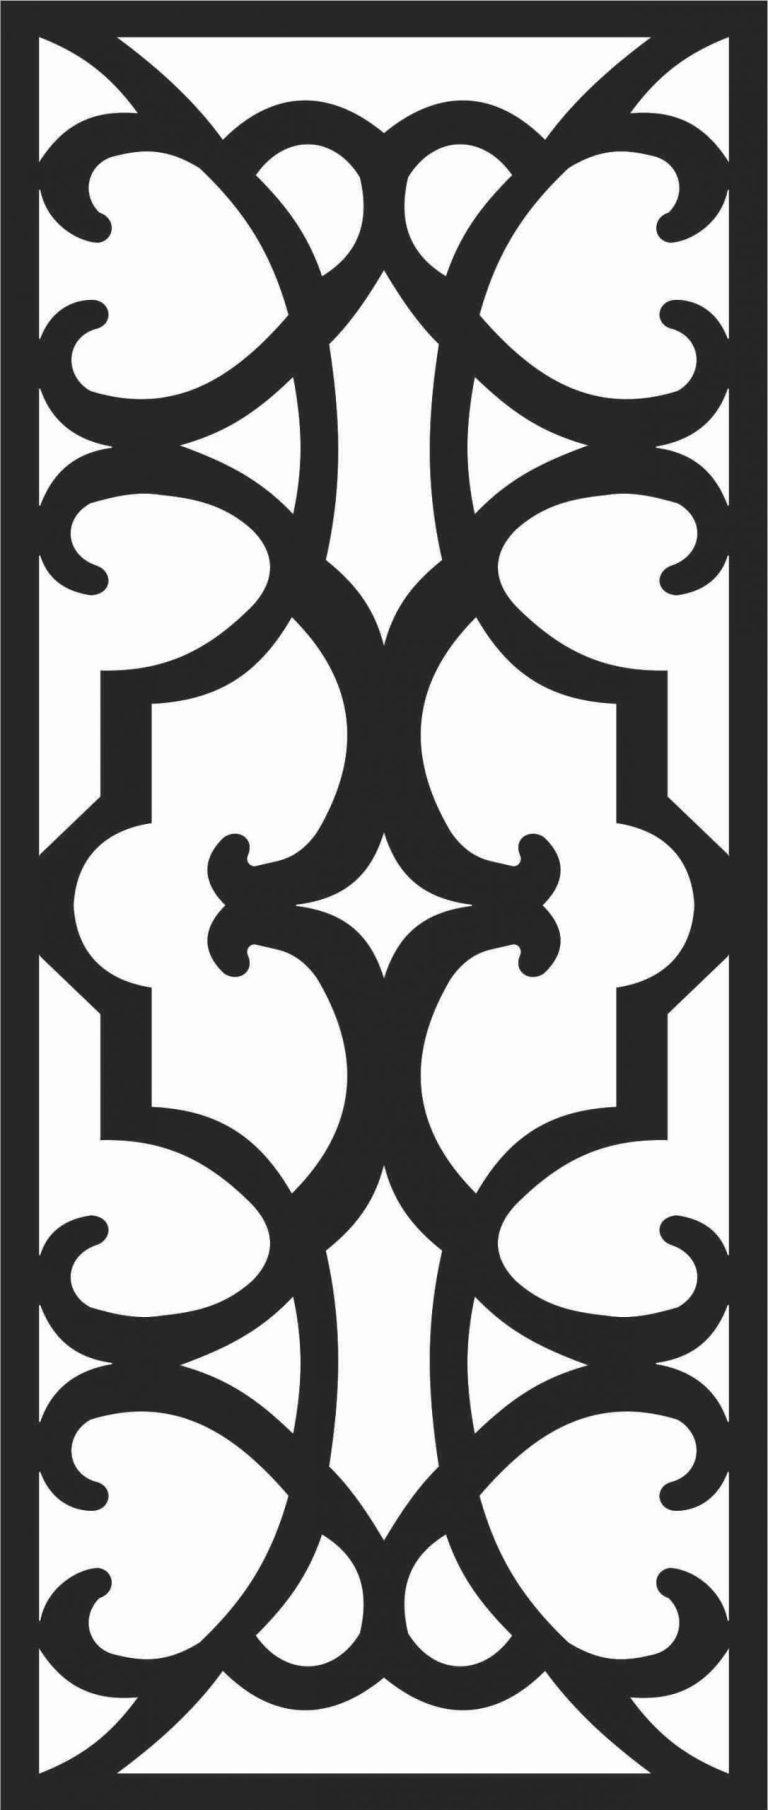 Screen Panel Patterns Seamless 49 Free DXF File